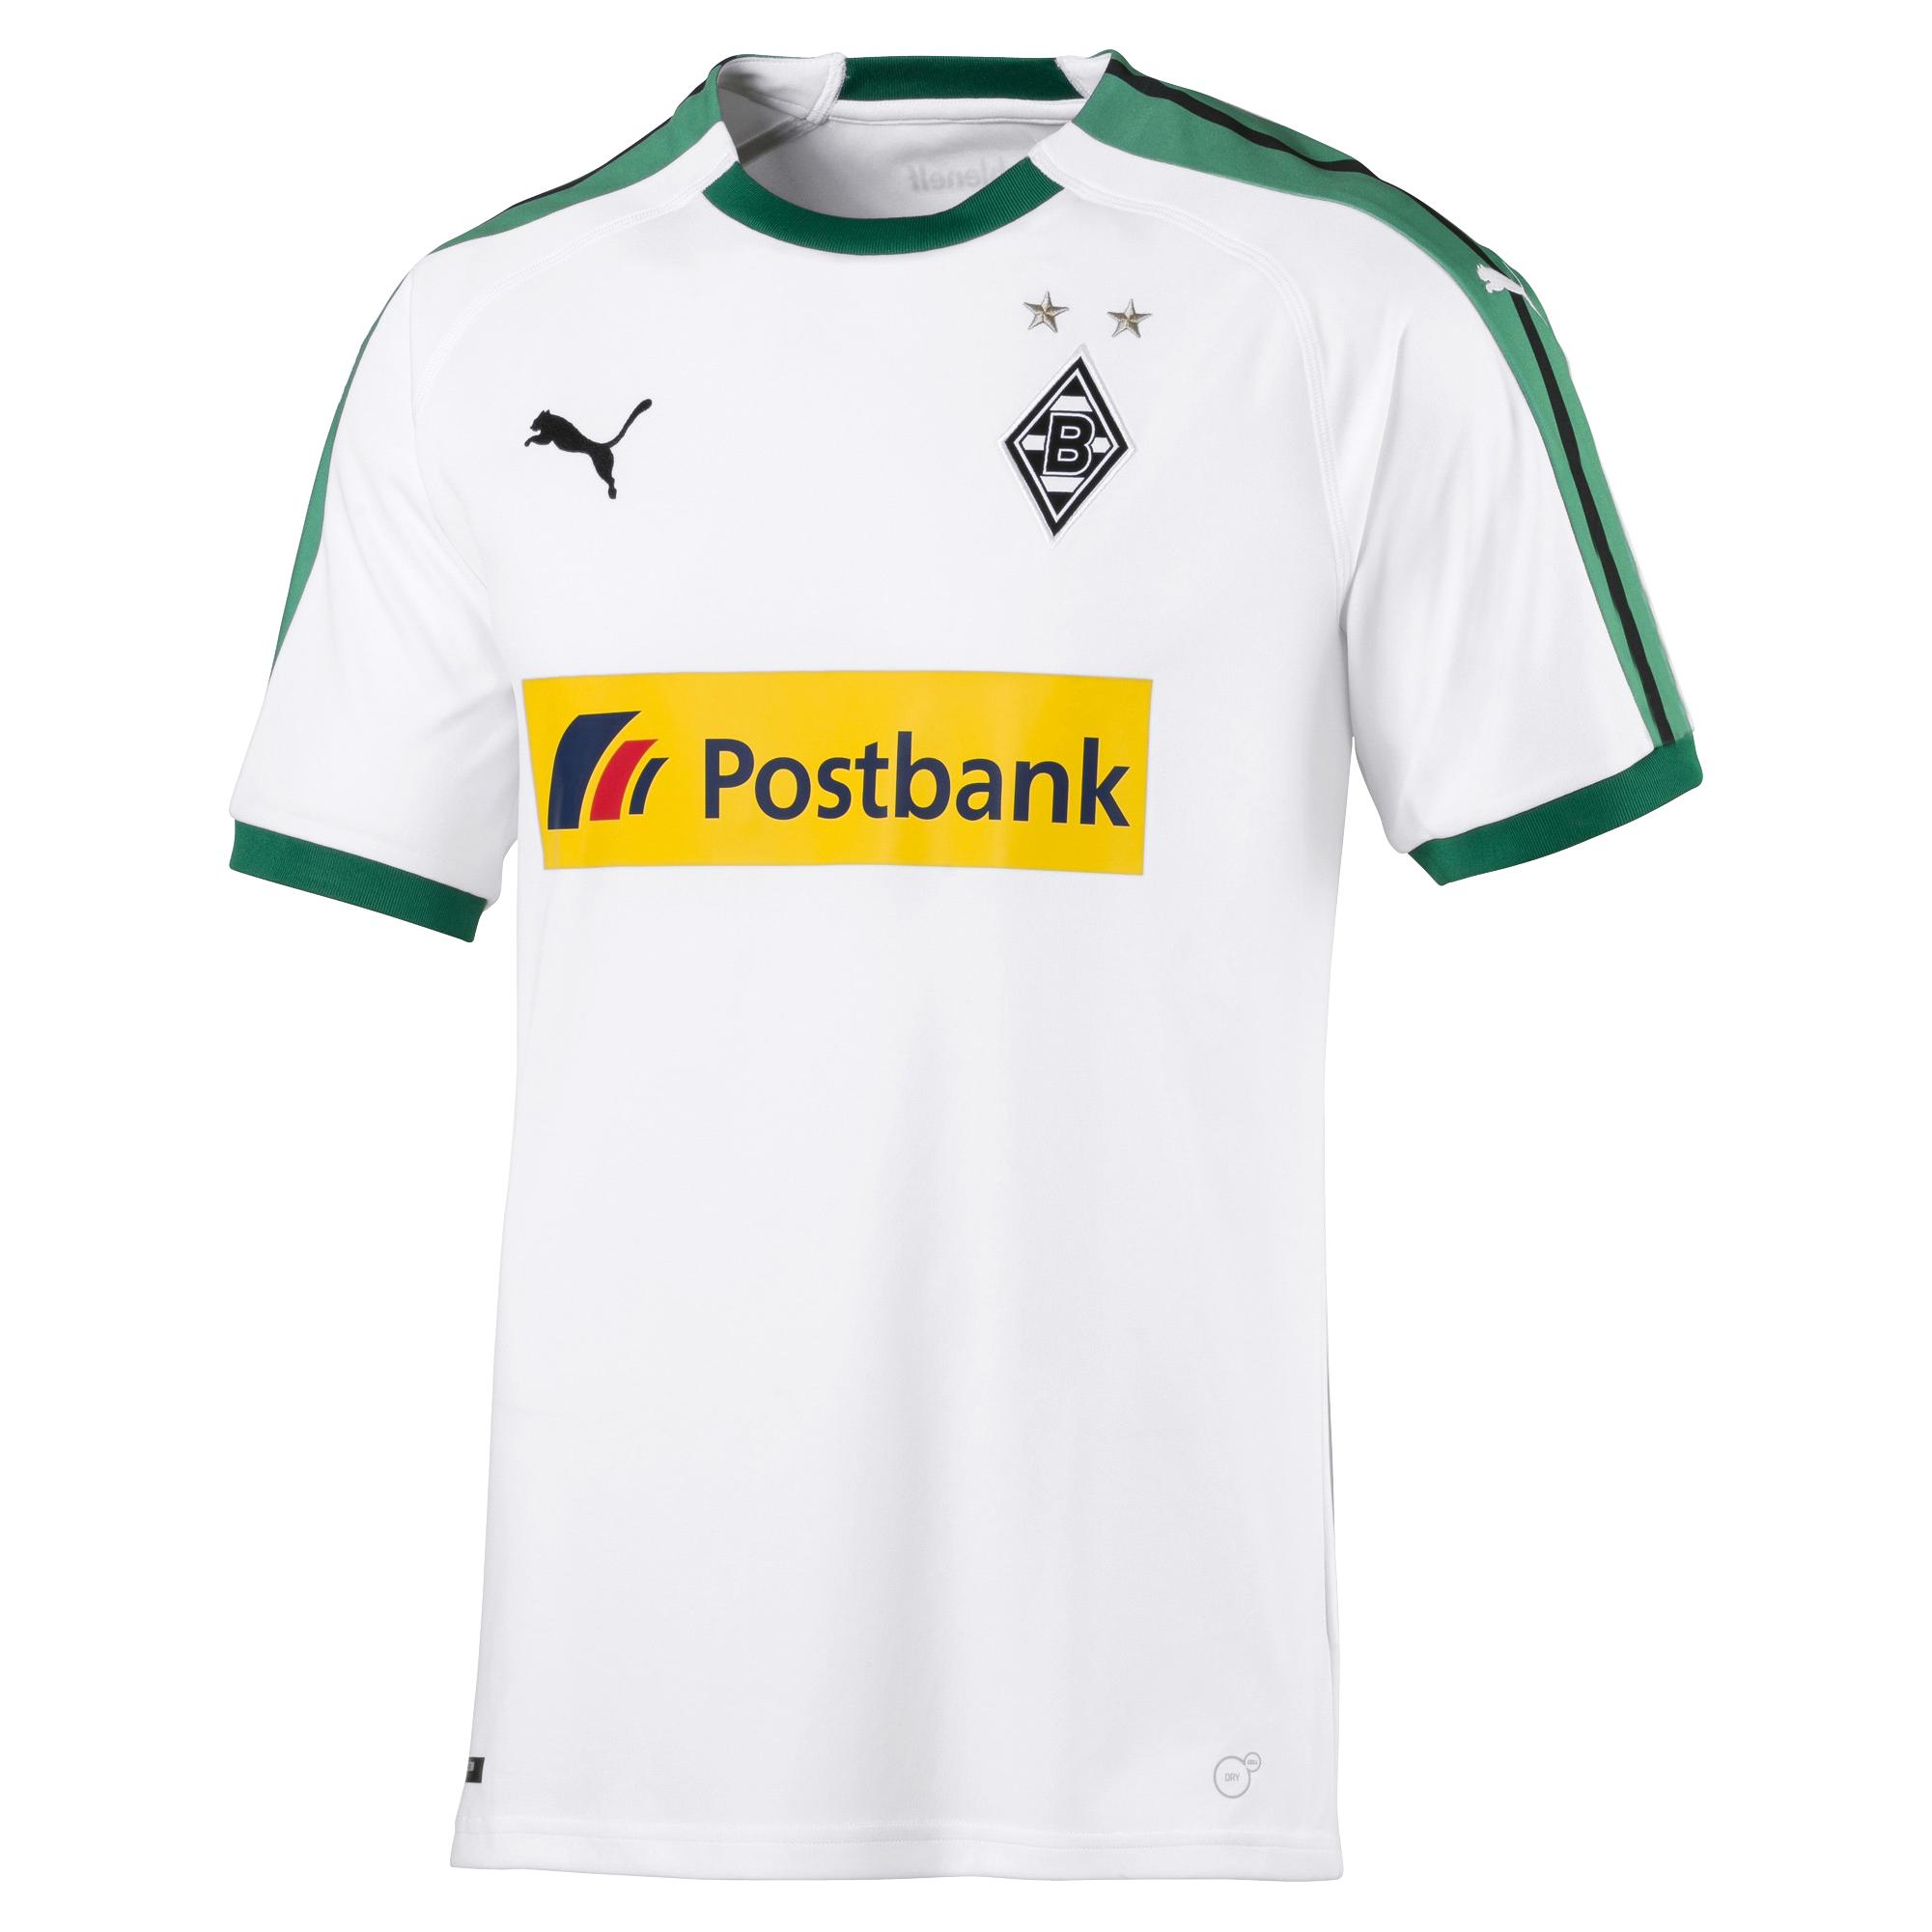 Puma Borussia Mönchengladbach - Herren Heimtrikot 18 19 - 753451-01 weiß 001 6e7448fee